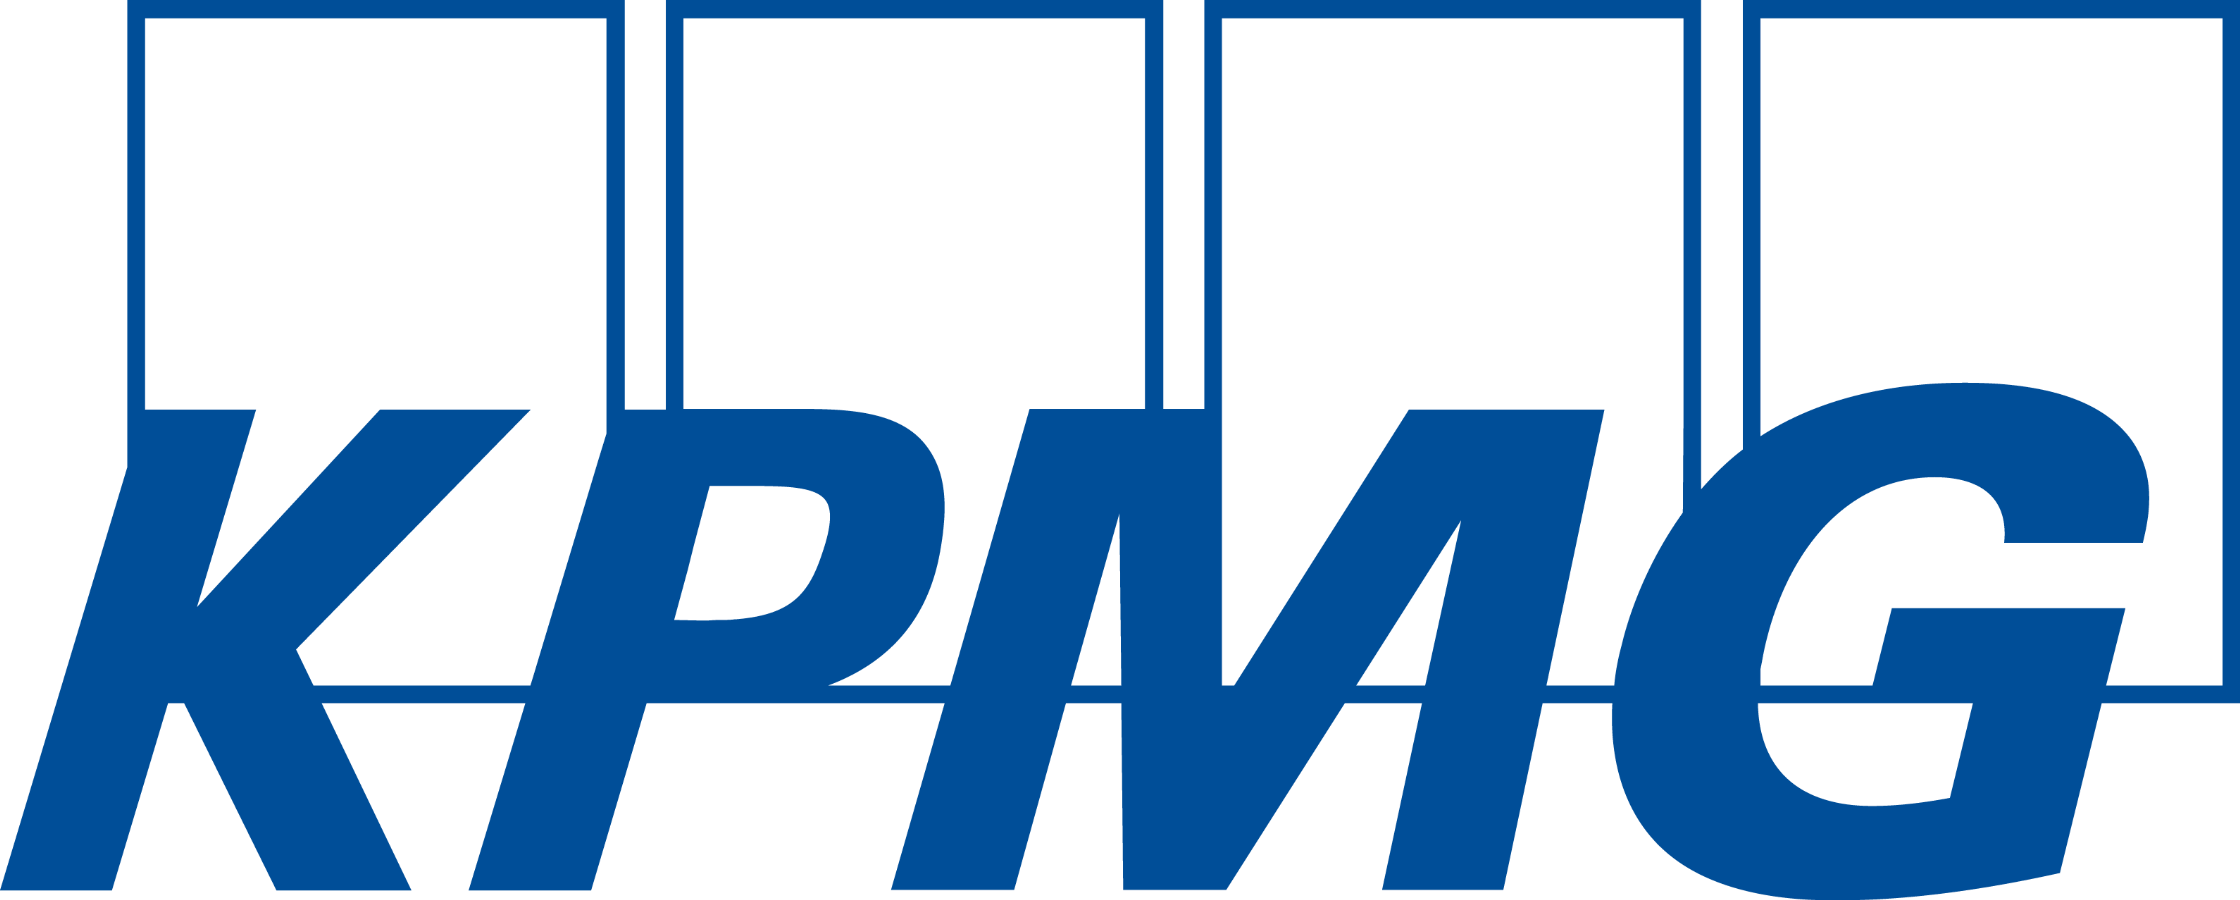 kgmp logo ile ilgili görsel sonucu